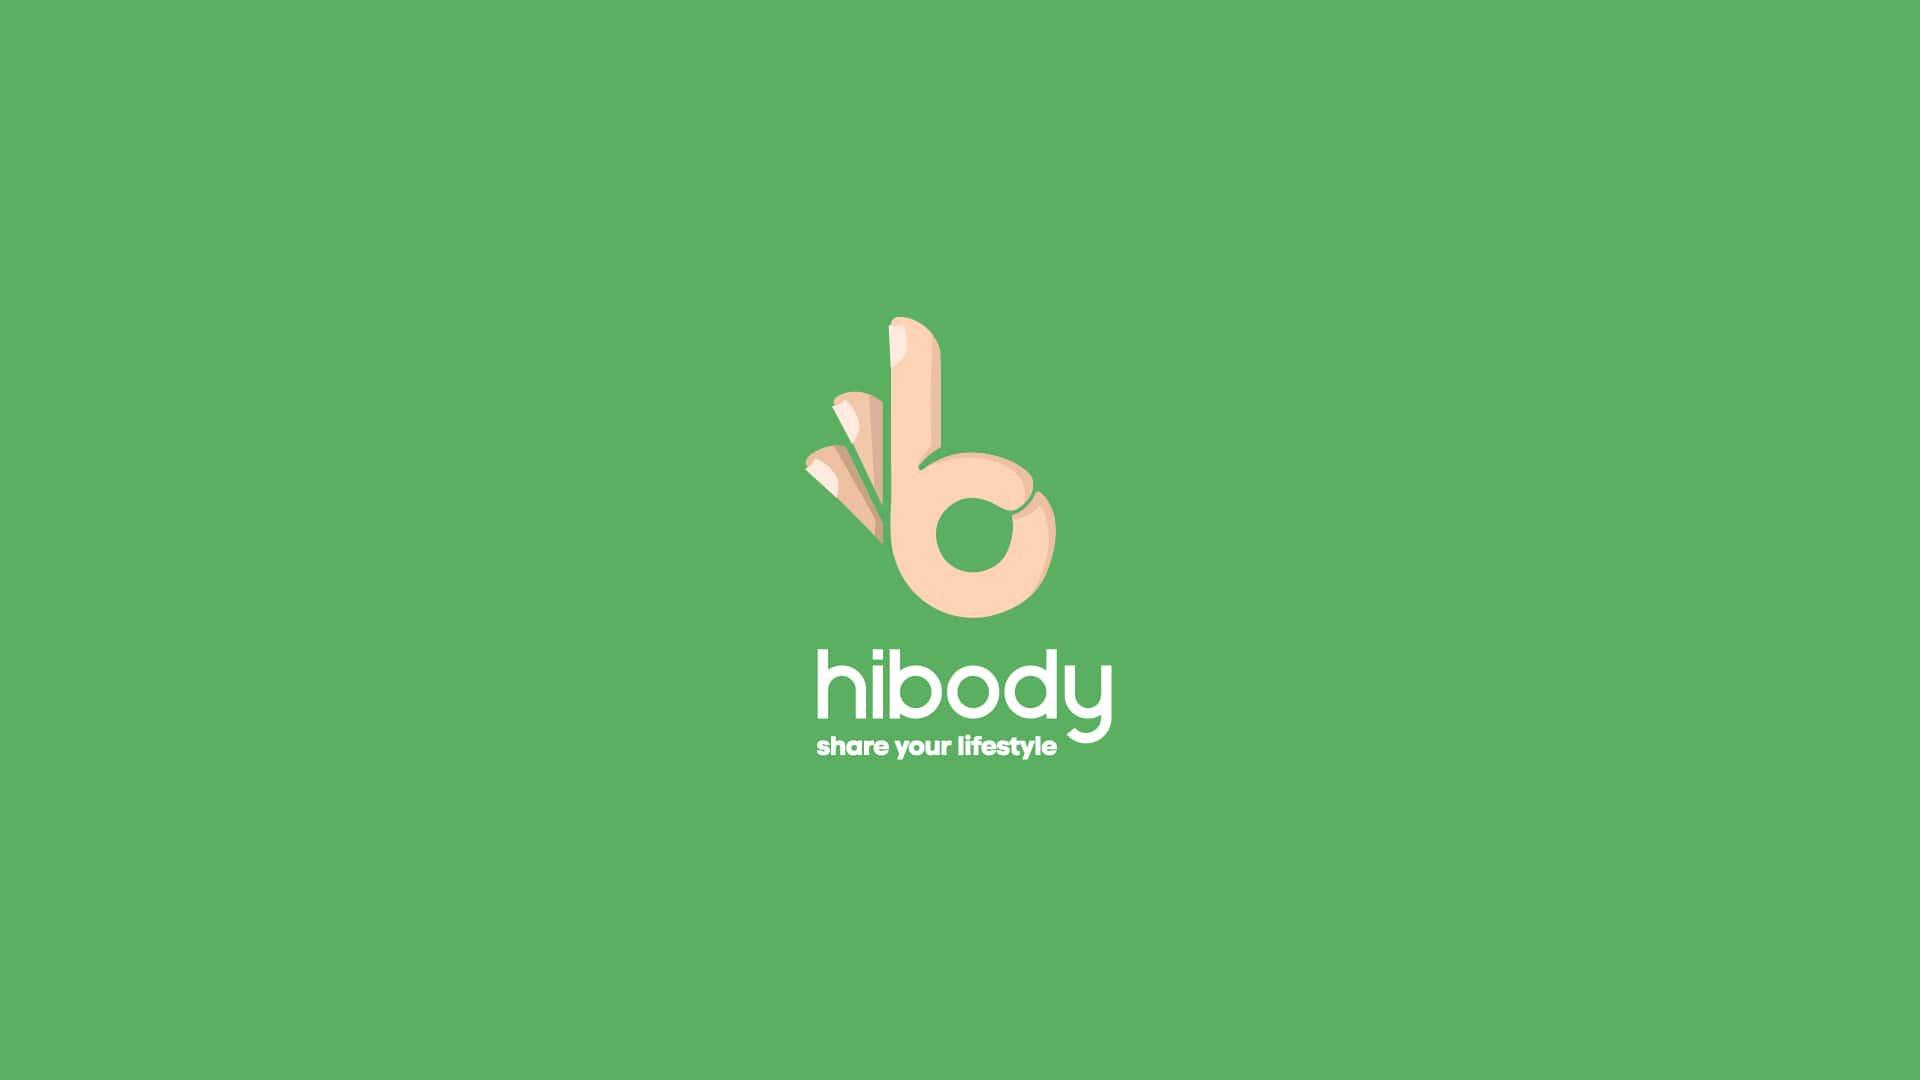 Bildmarke: hibody share your lifestyle